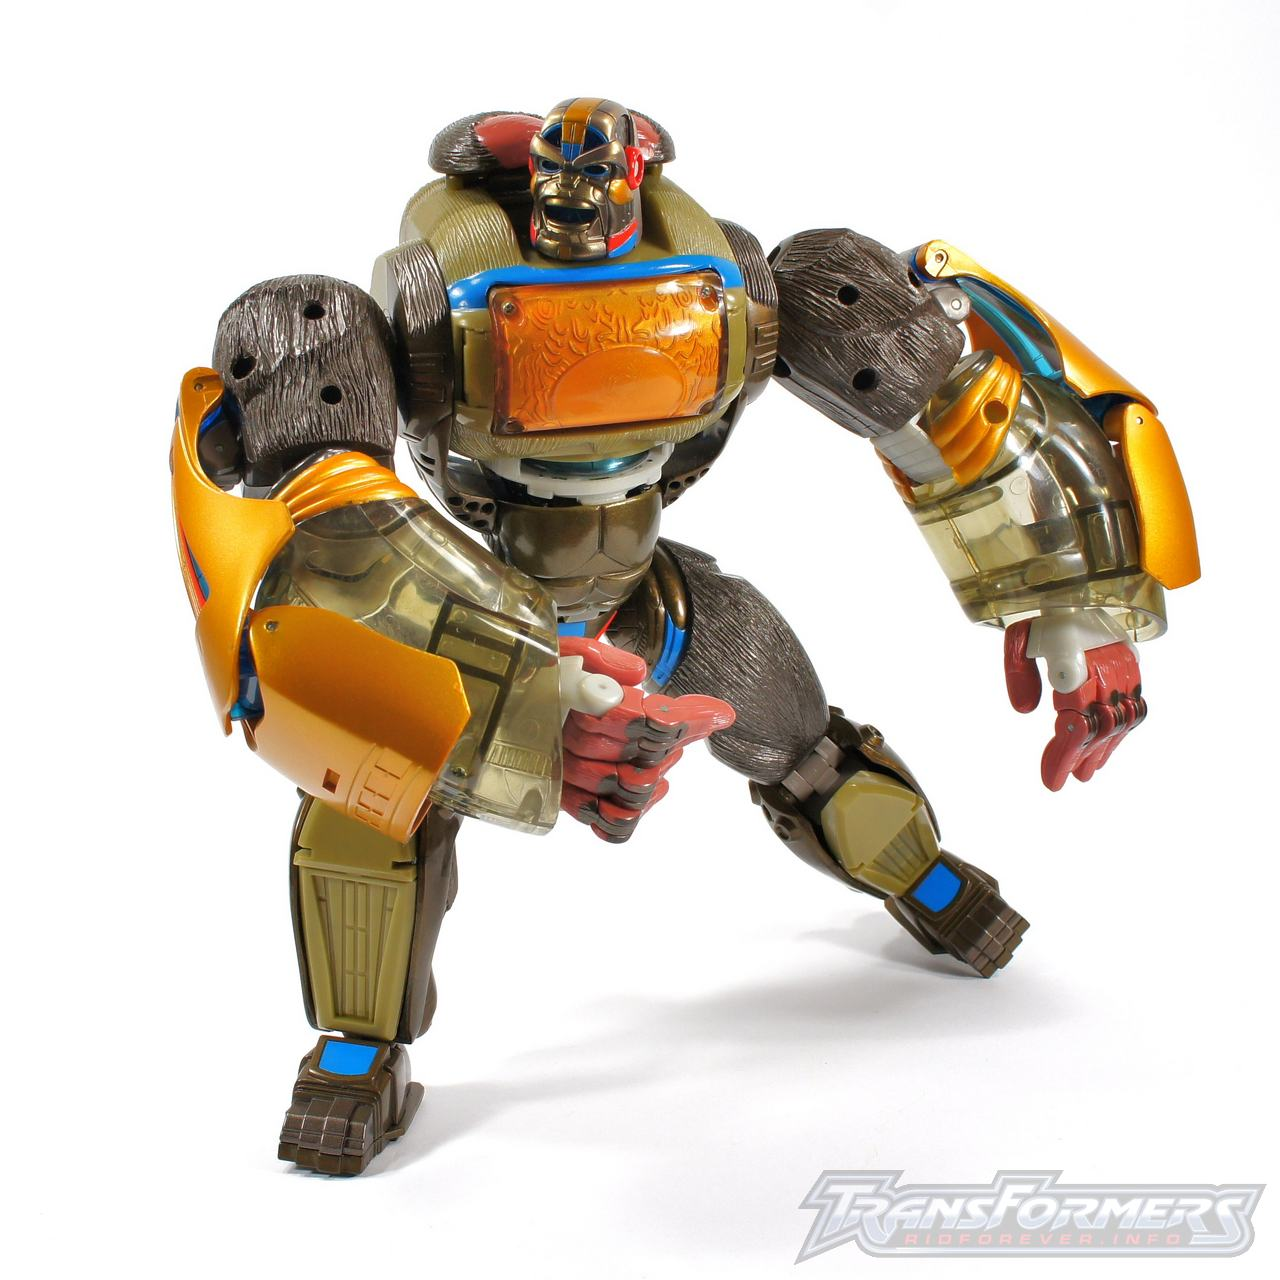 Air Attack Optimus Primal 006